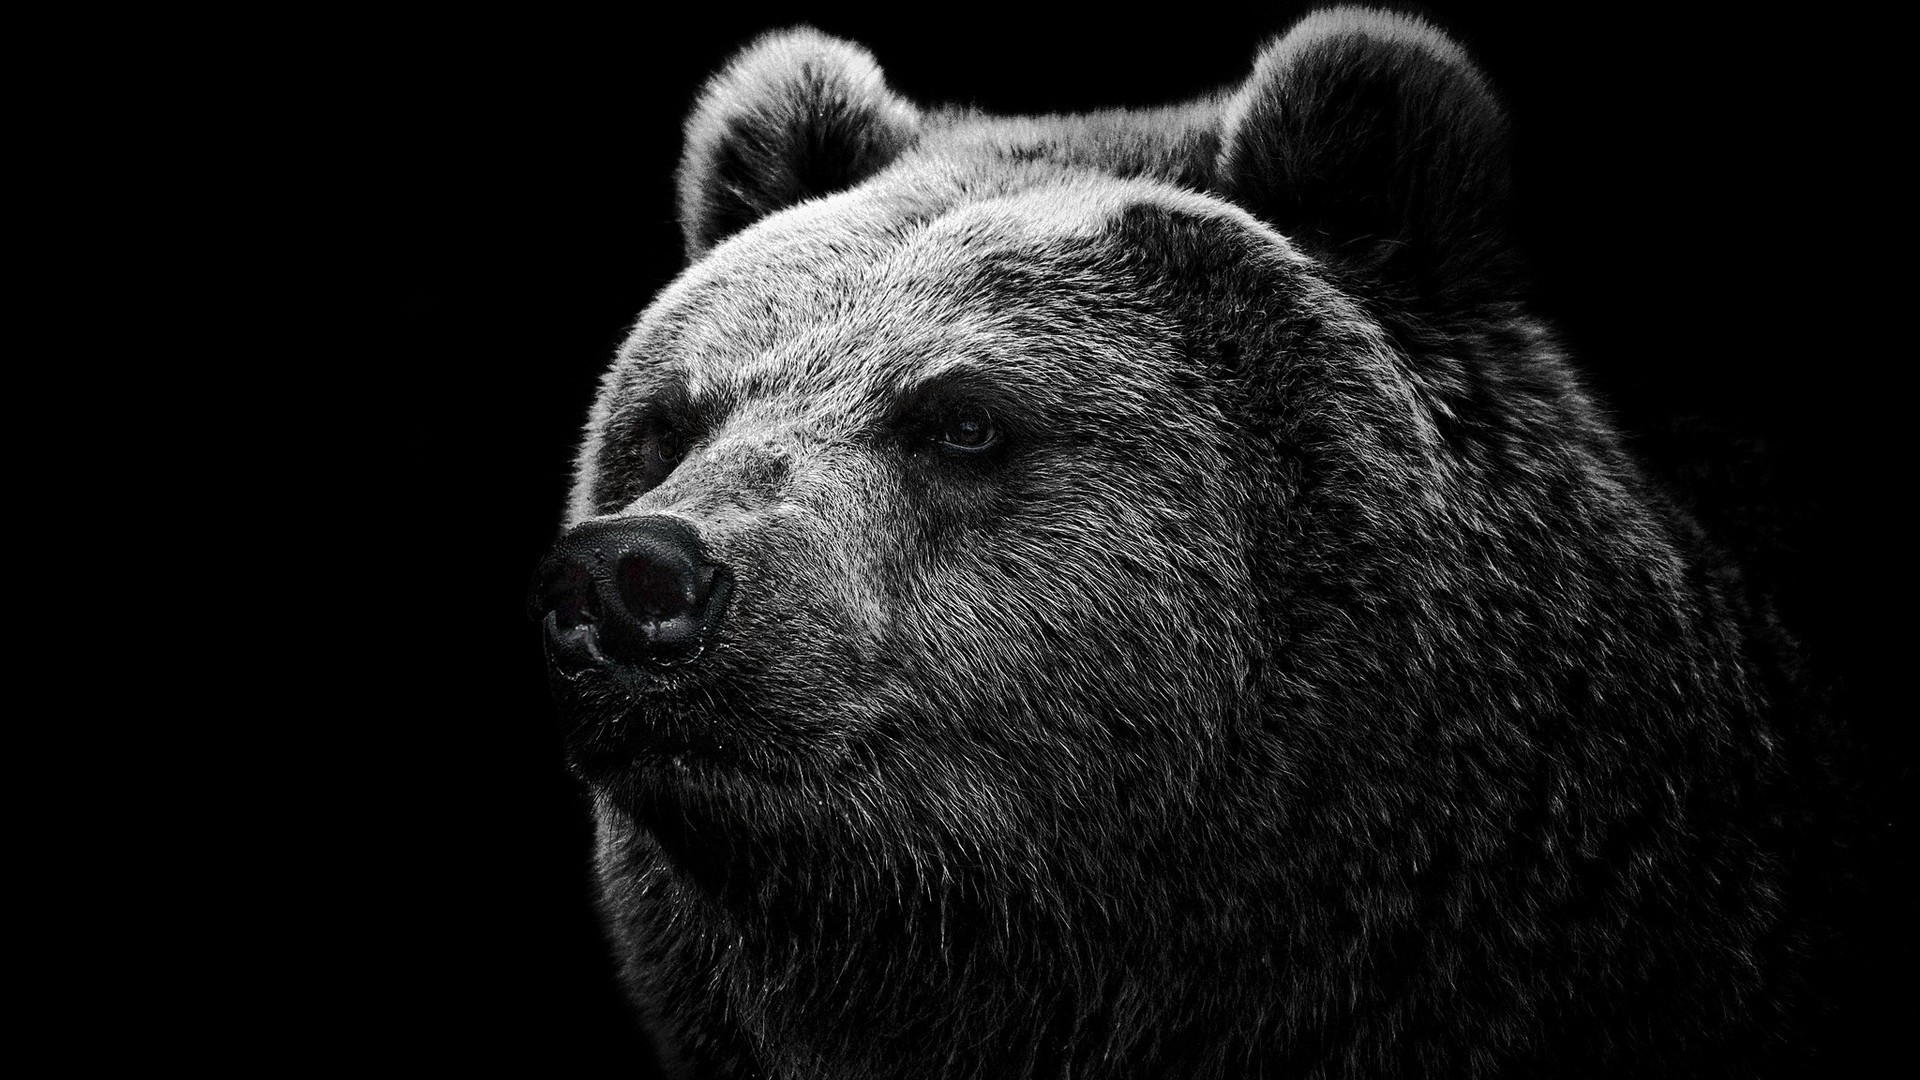 Cute Bear Face Black Black White Download Hd Wallpaper Image Wallpaper